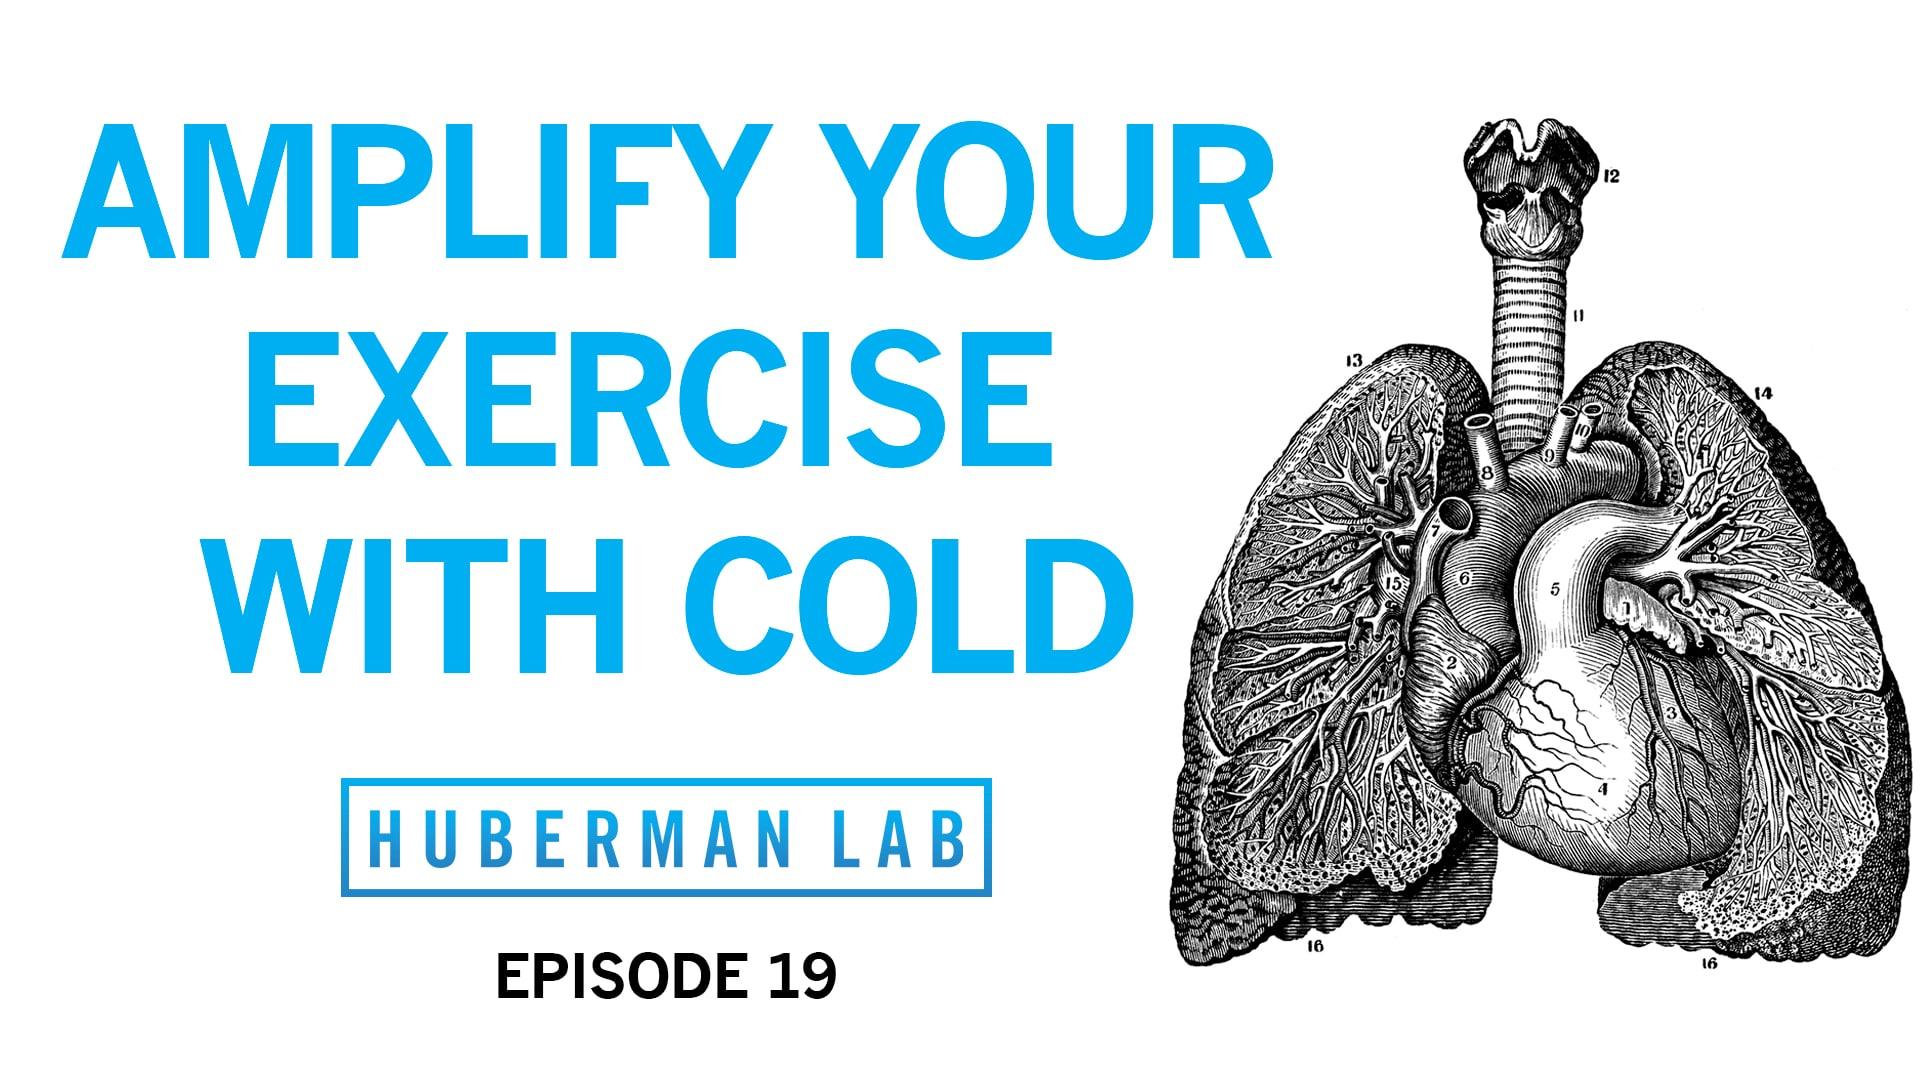 Huberman Lab Podcast Episode 19 Title Card